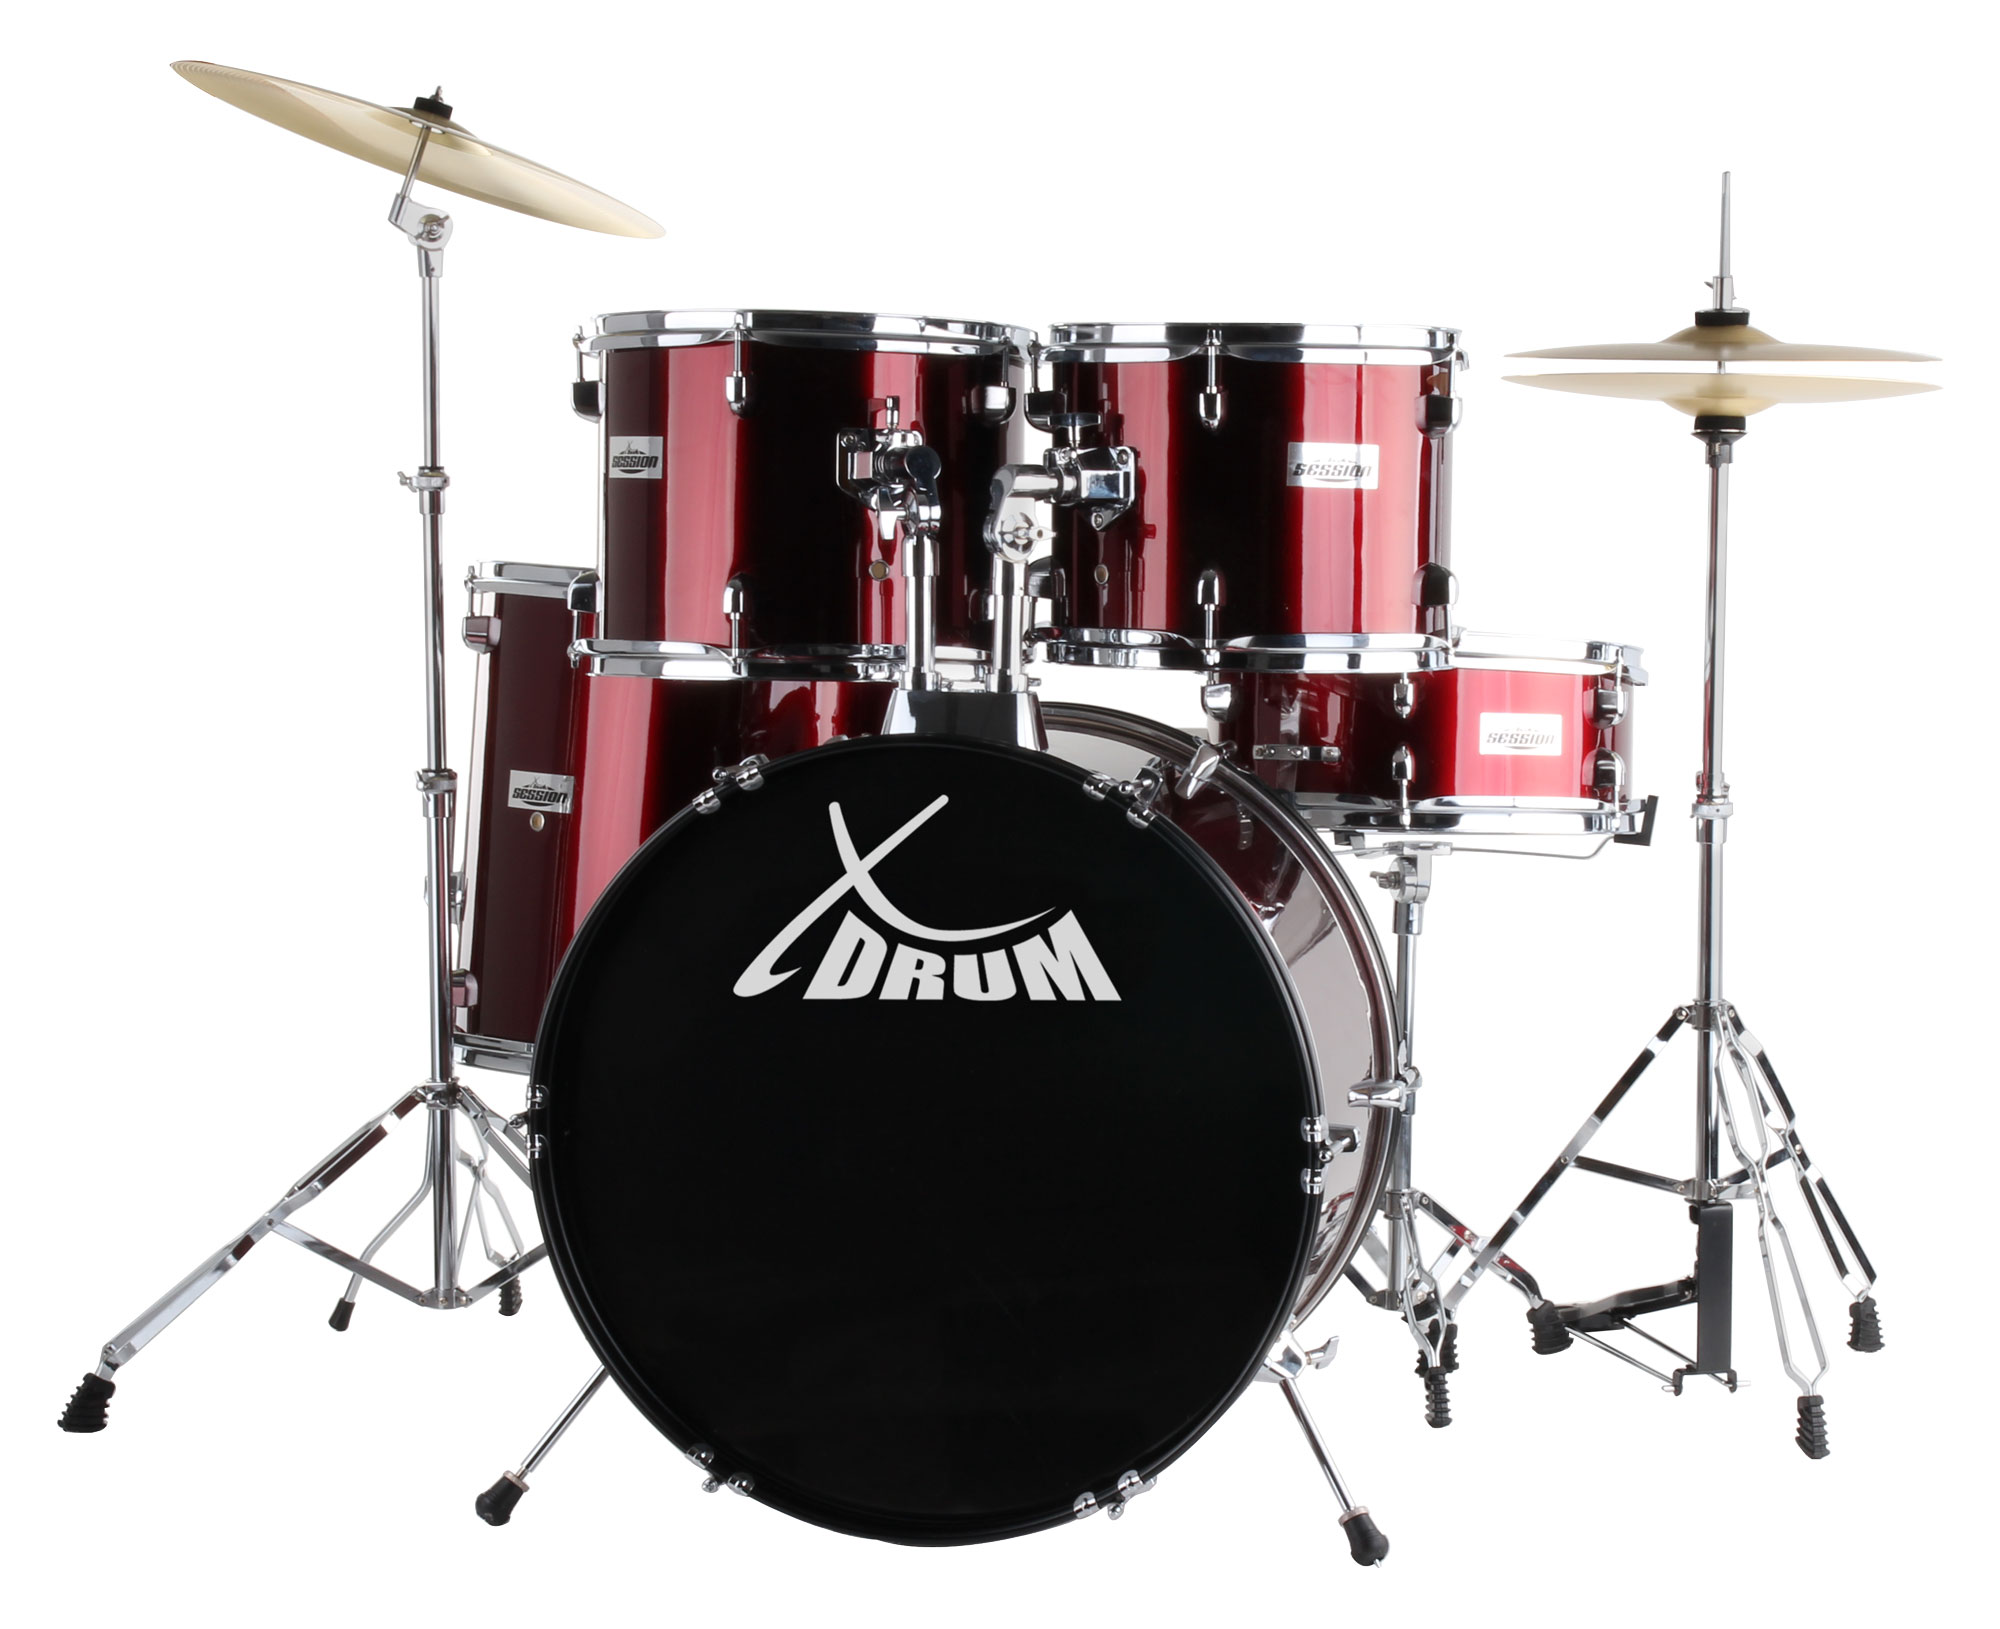 XDrum Semi 22' Standard Schlagzeug Set Lipstick Red inkl. Schule DVD